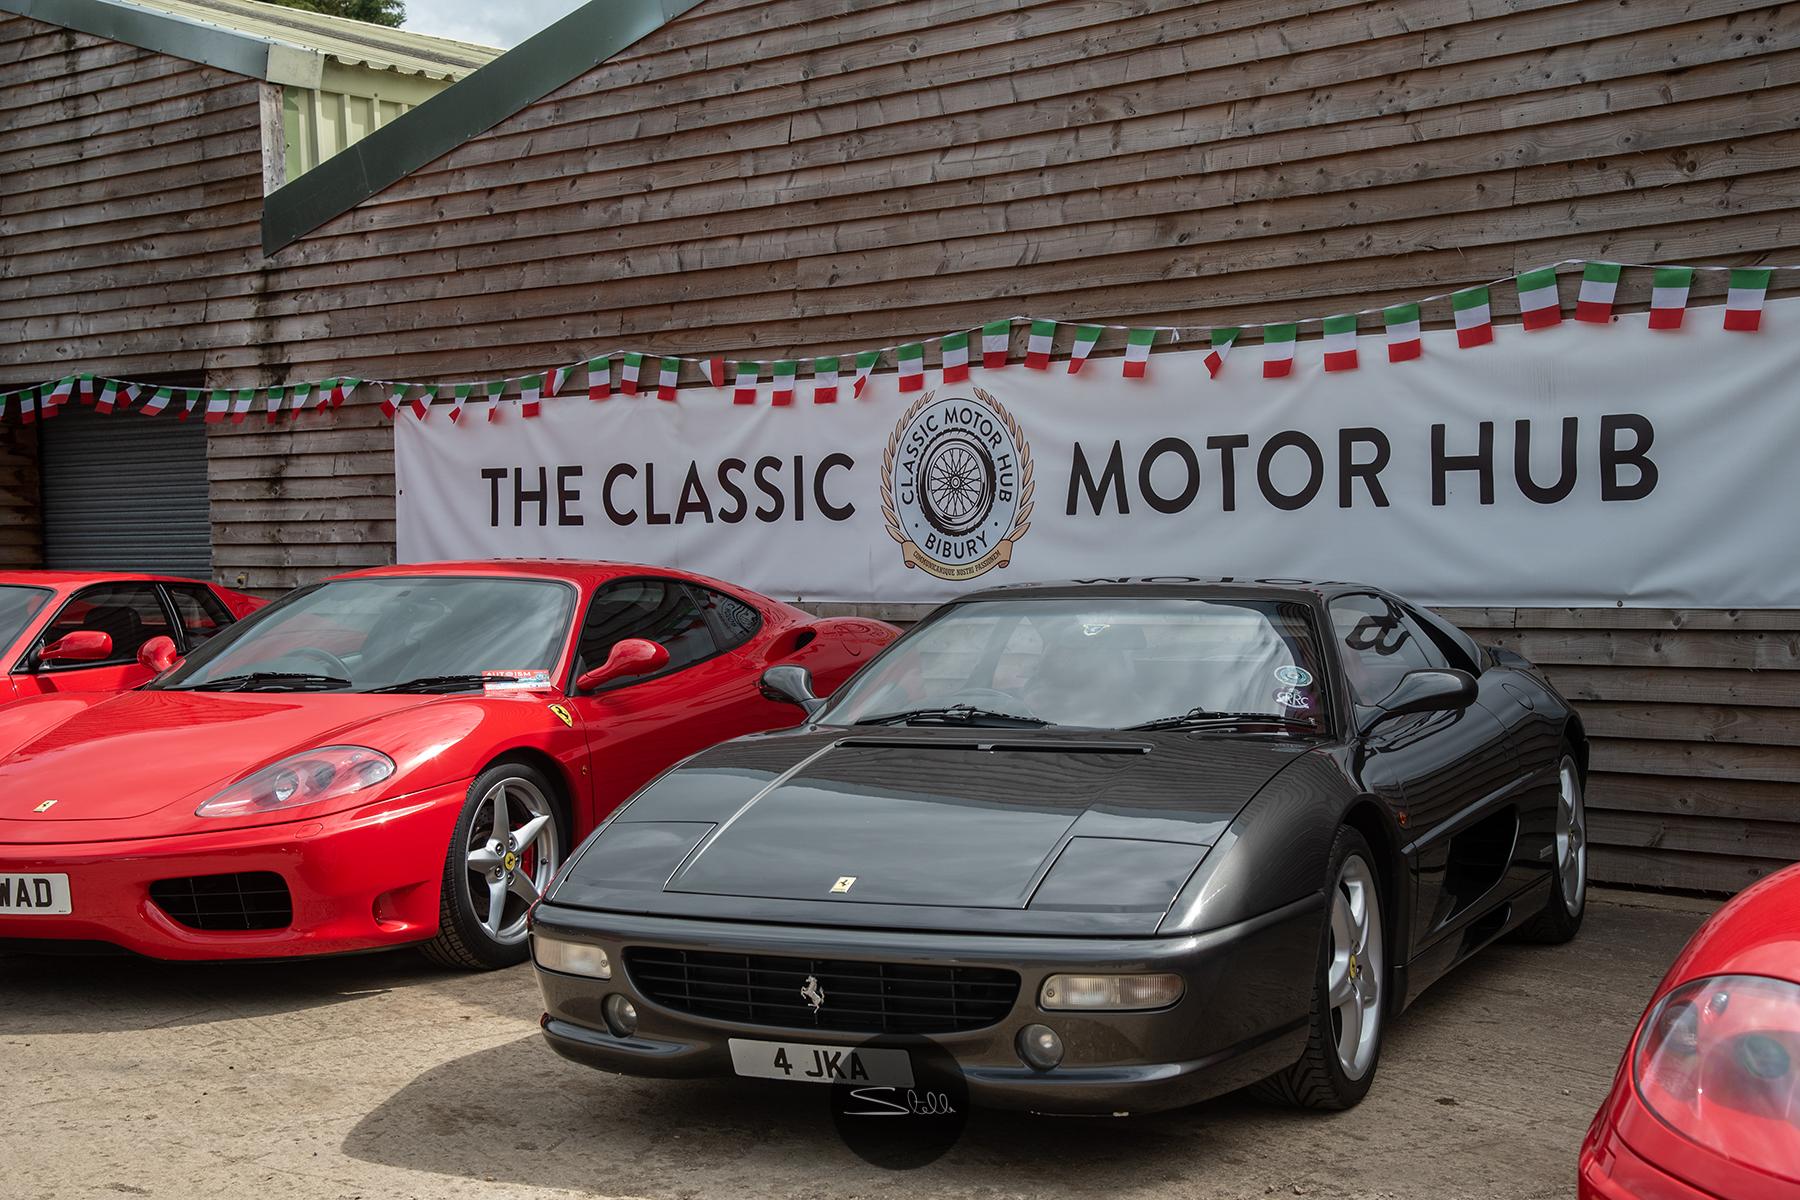 Stella Scordellis -20190505 The Classic Motor Hub157c.jpg